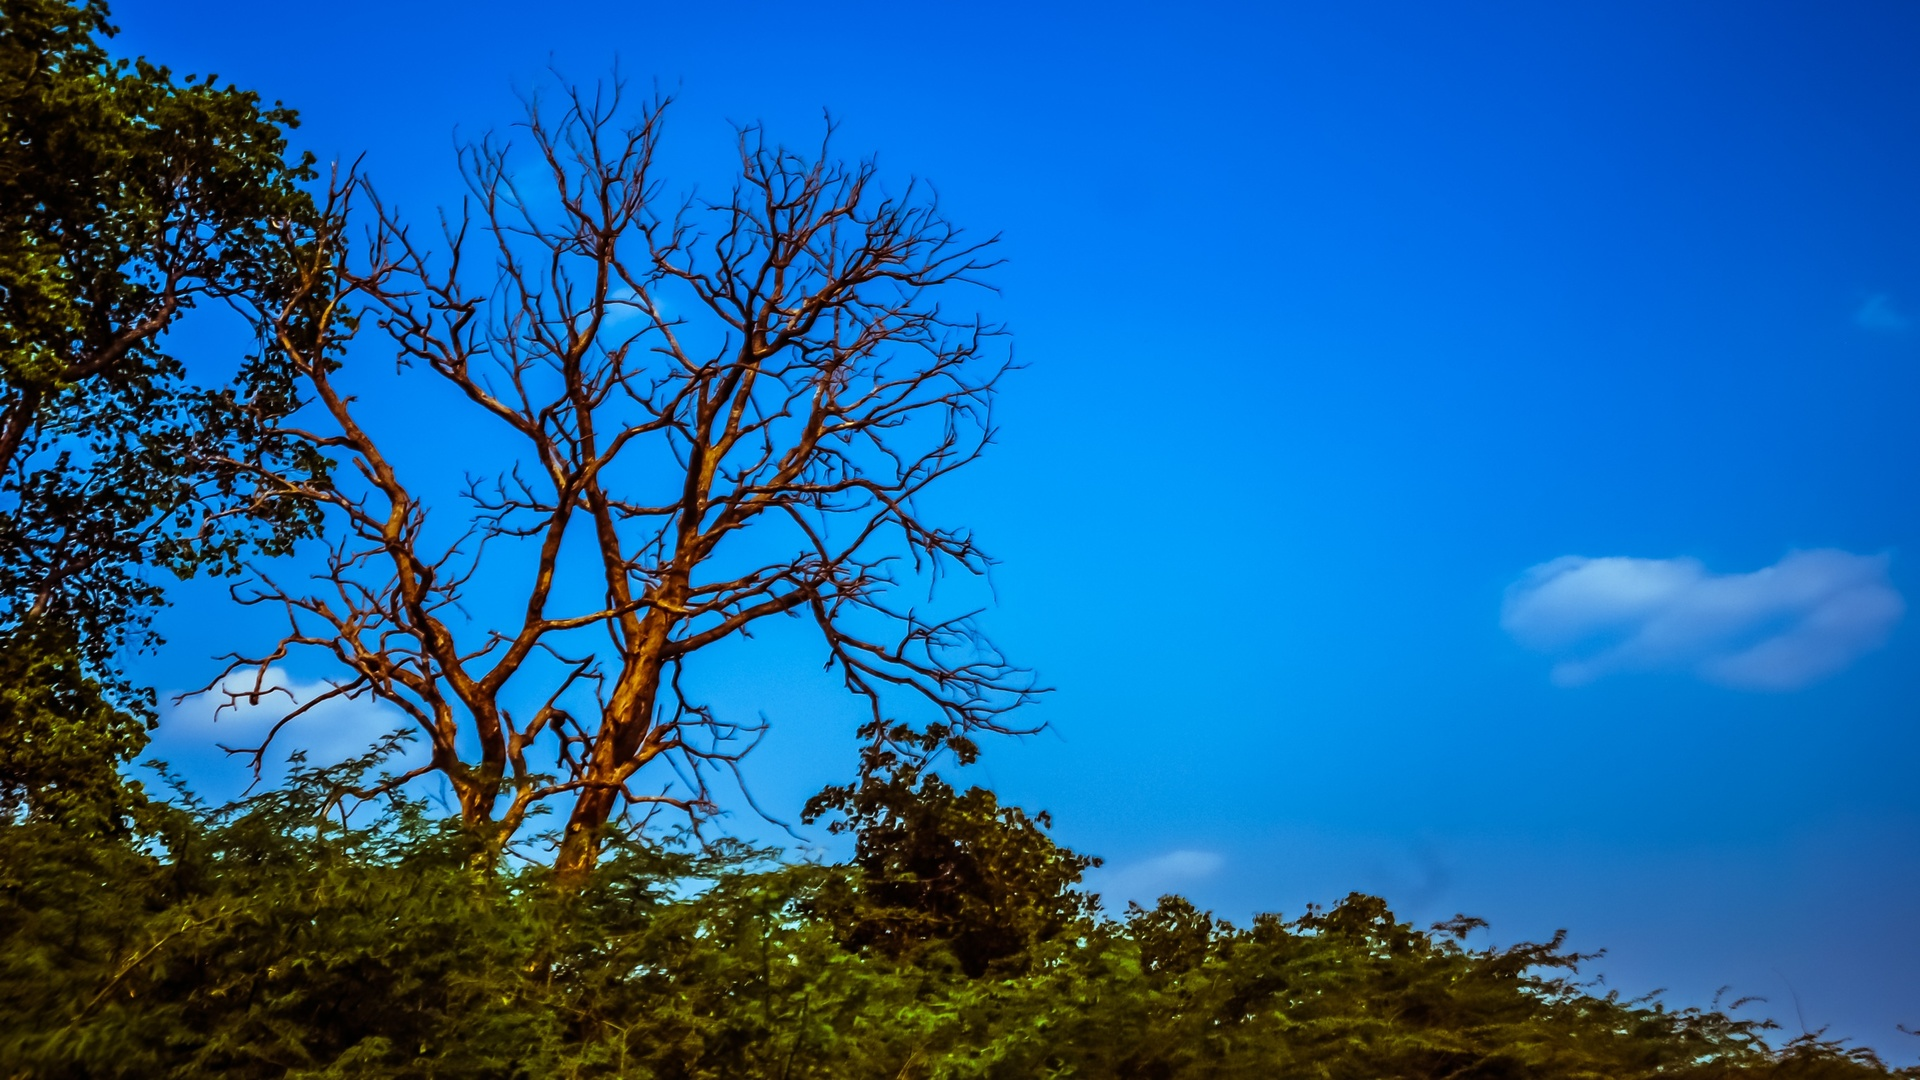 tree | no person, nature, landscape, sky